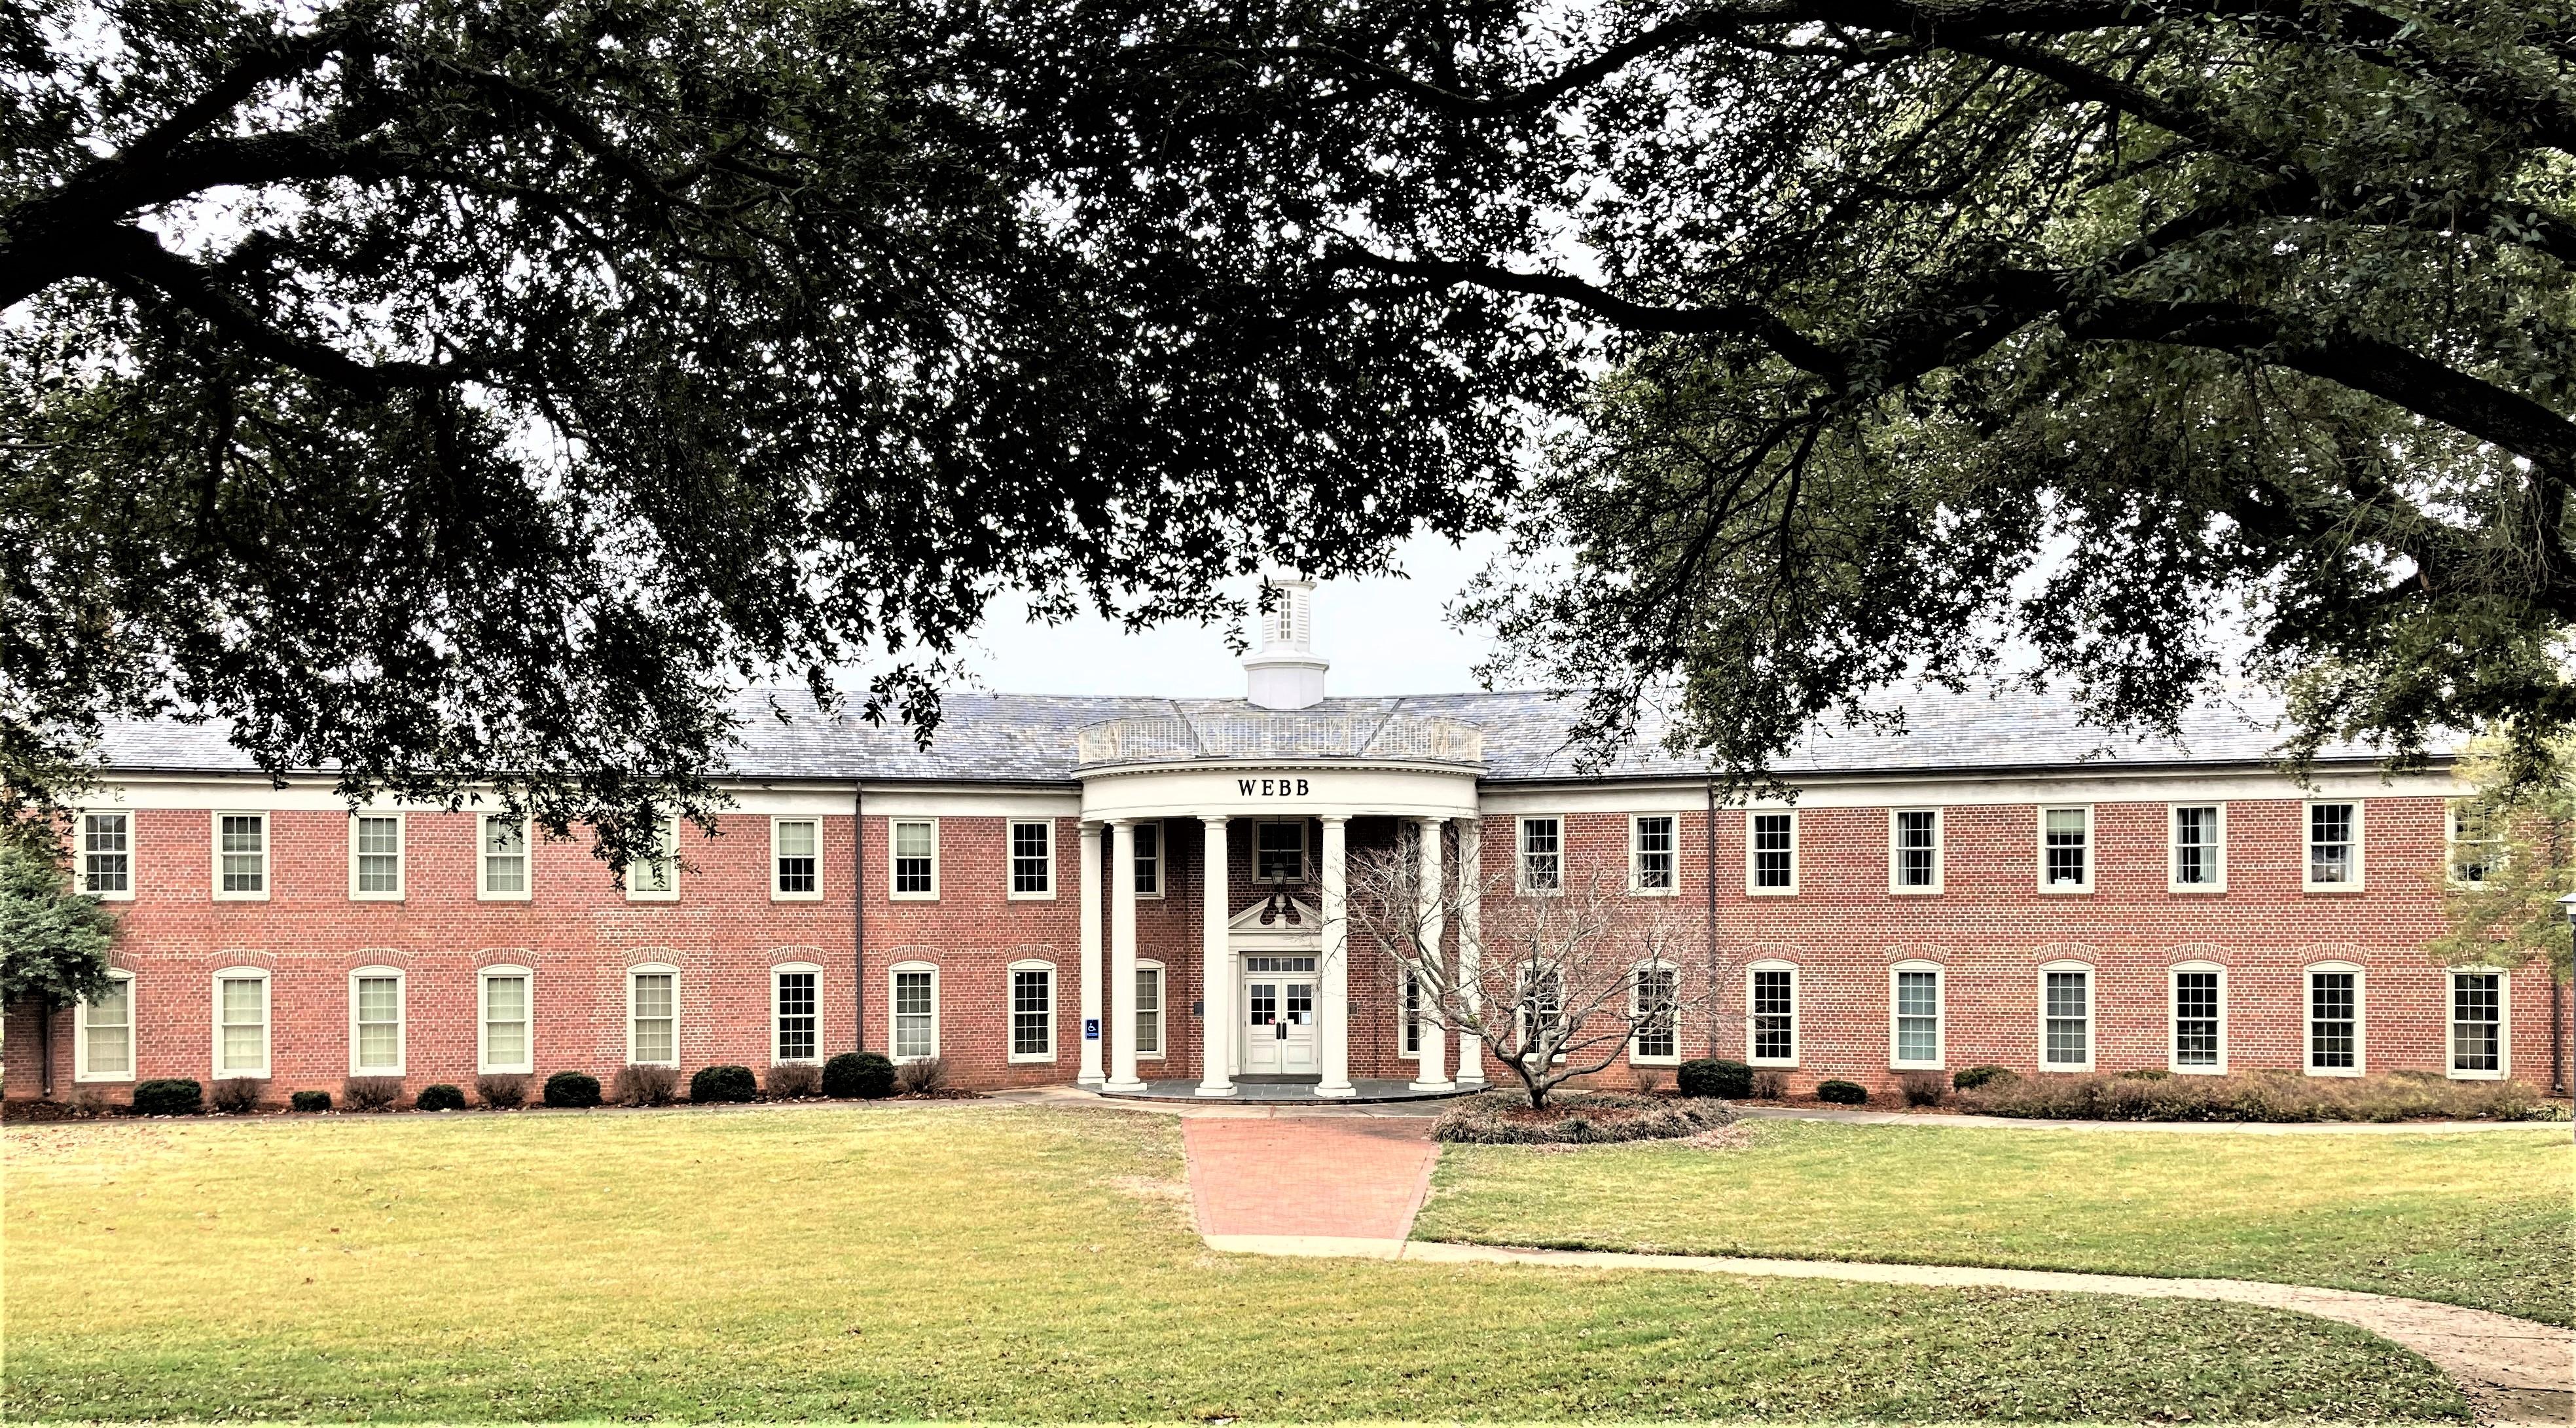 Webb Hall - Front